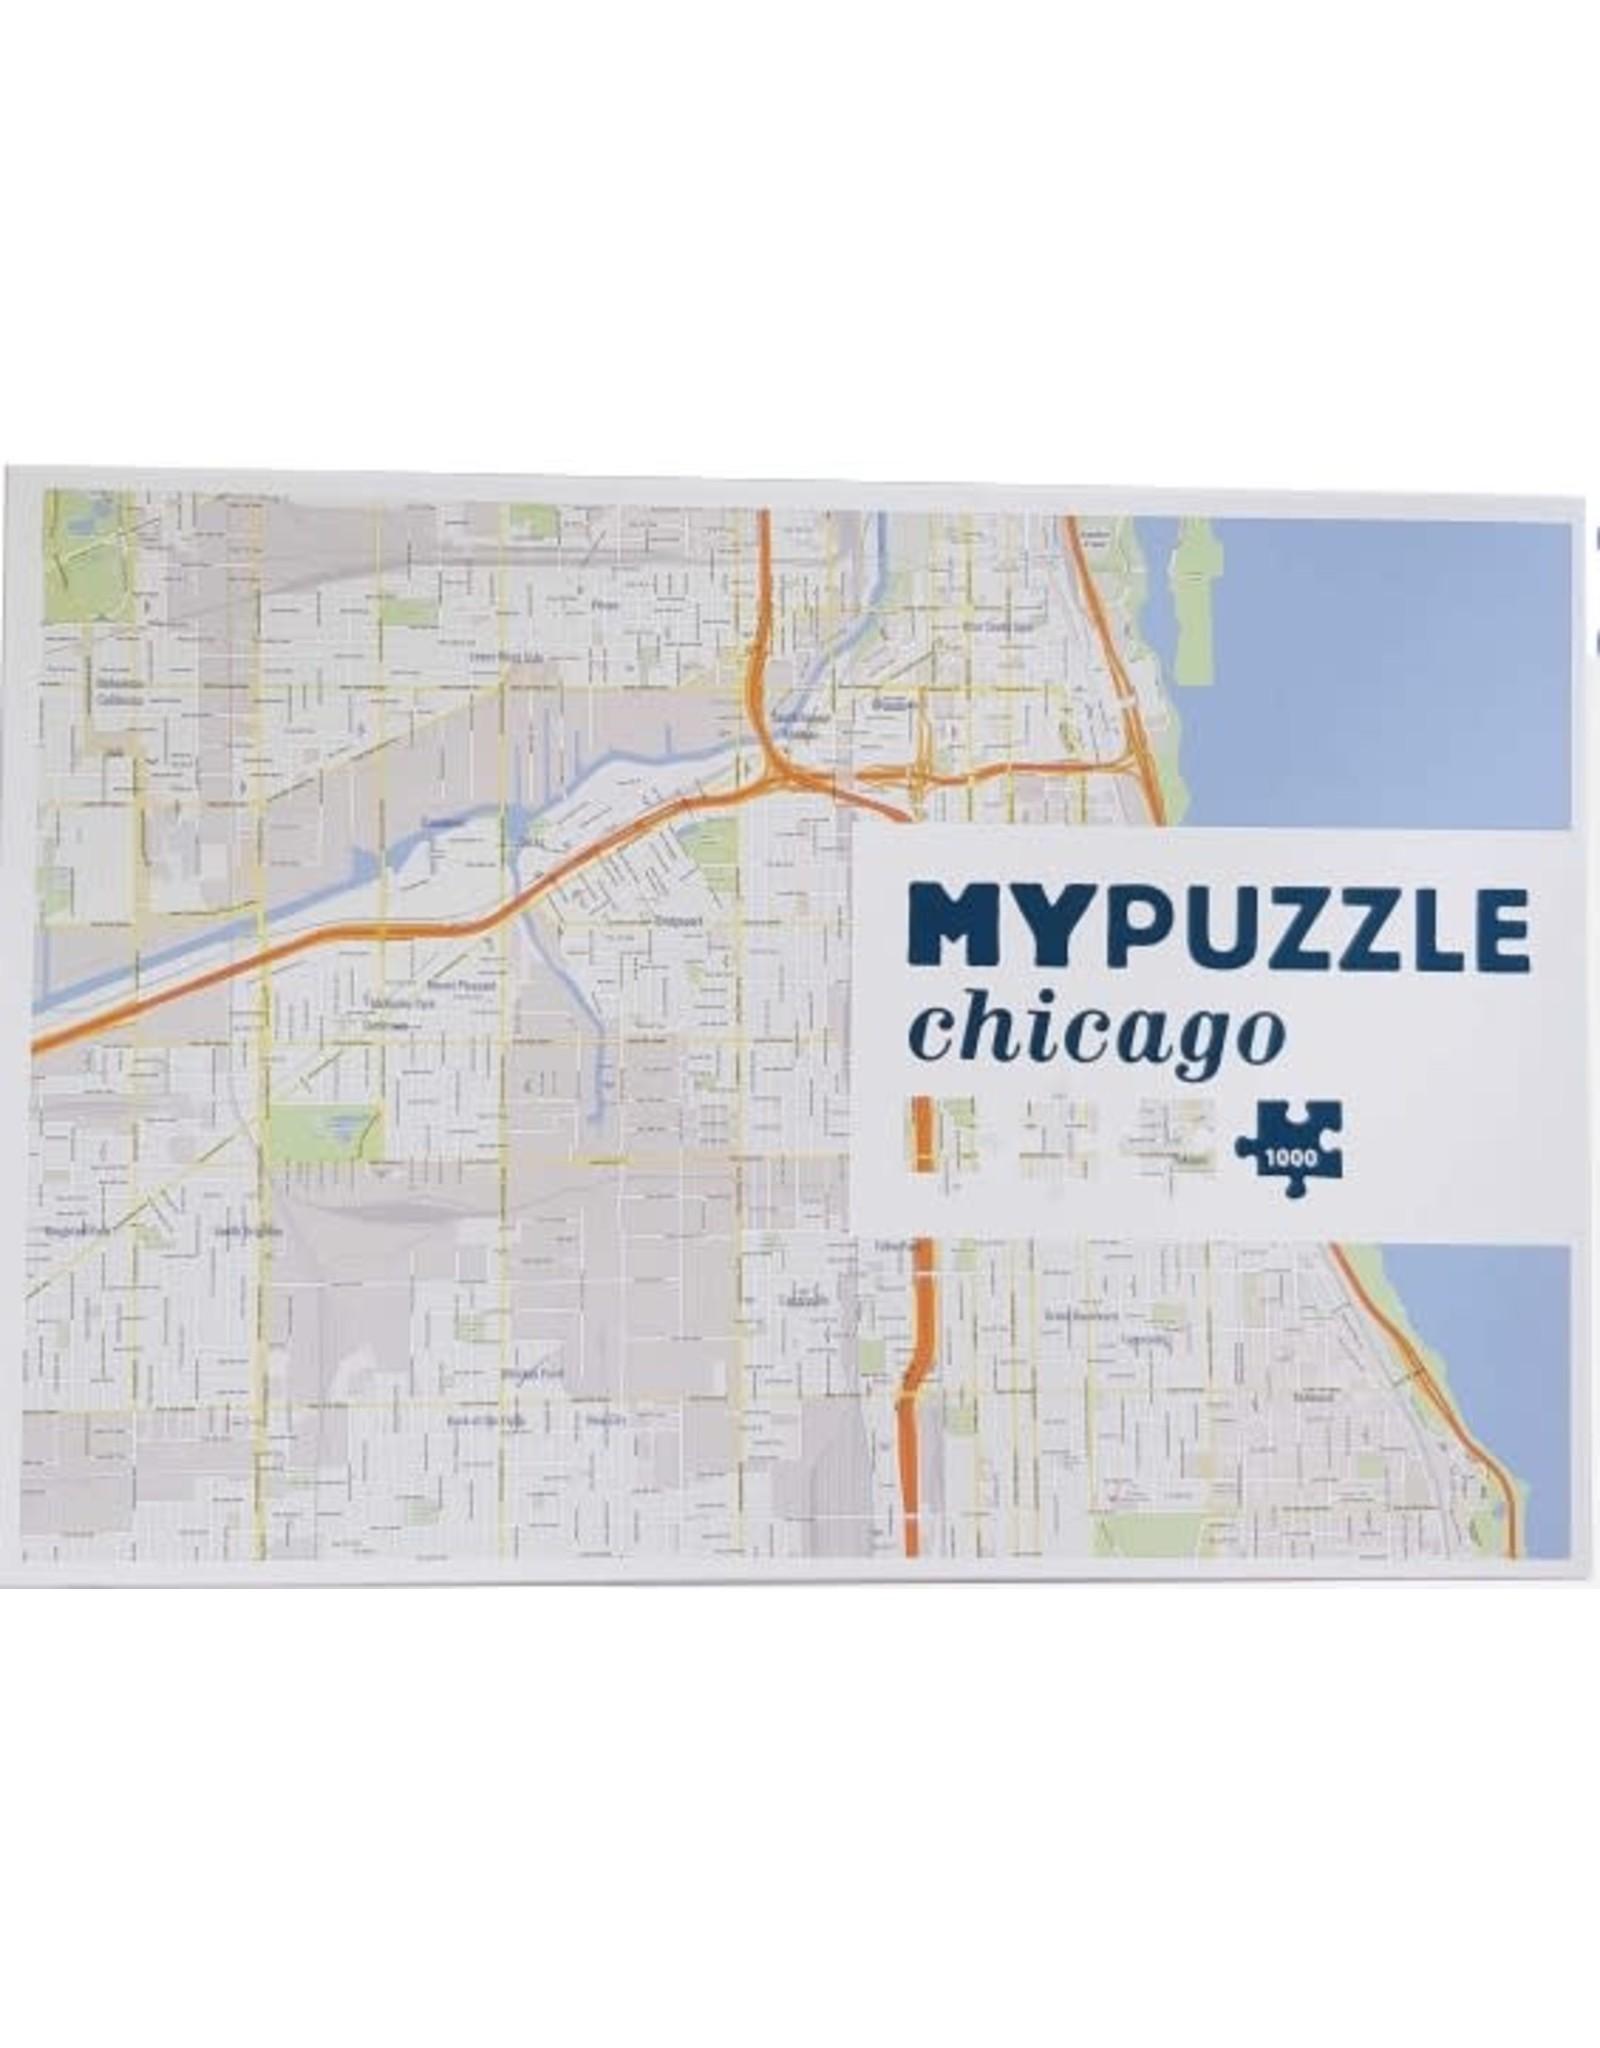 Mypuzzle Mypuzzle Chicago